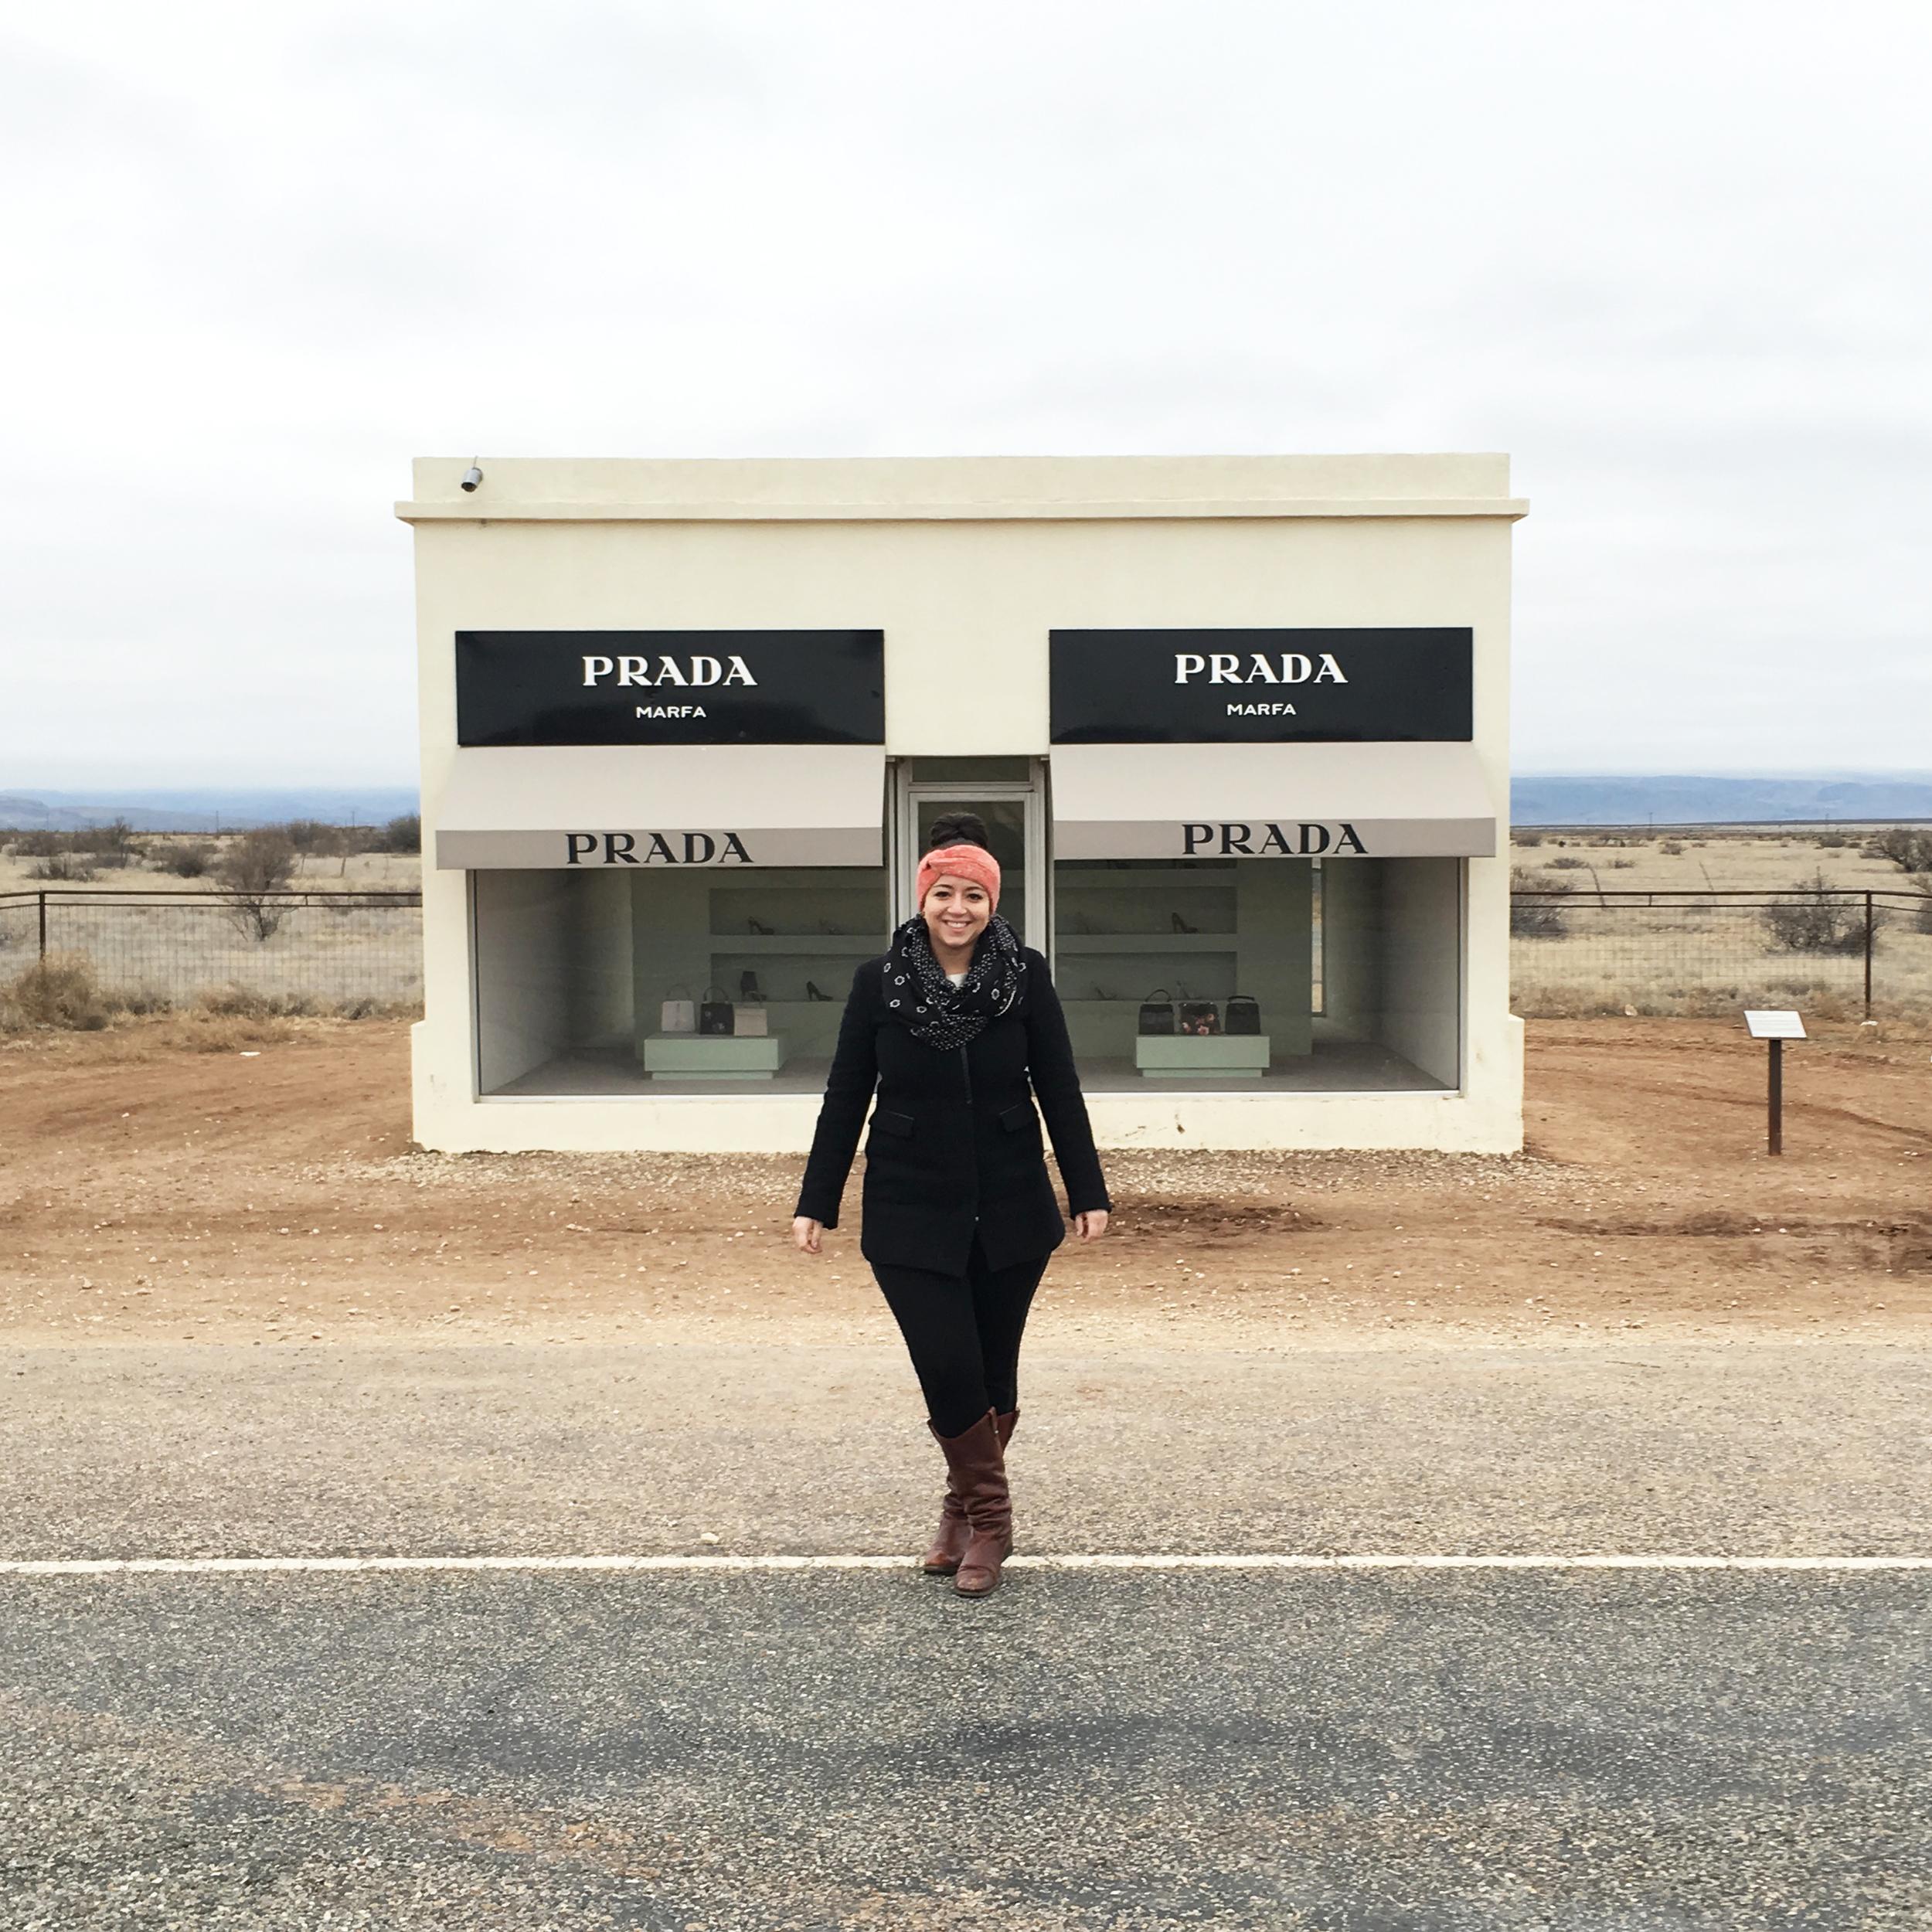 """Prada Marfa"" permanent art installation — Marfa, Texas"